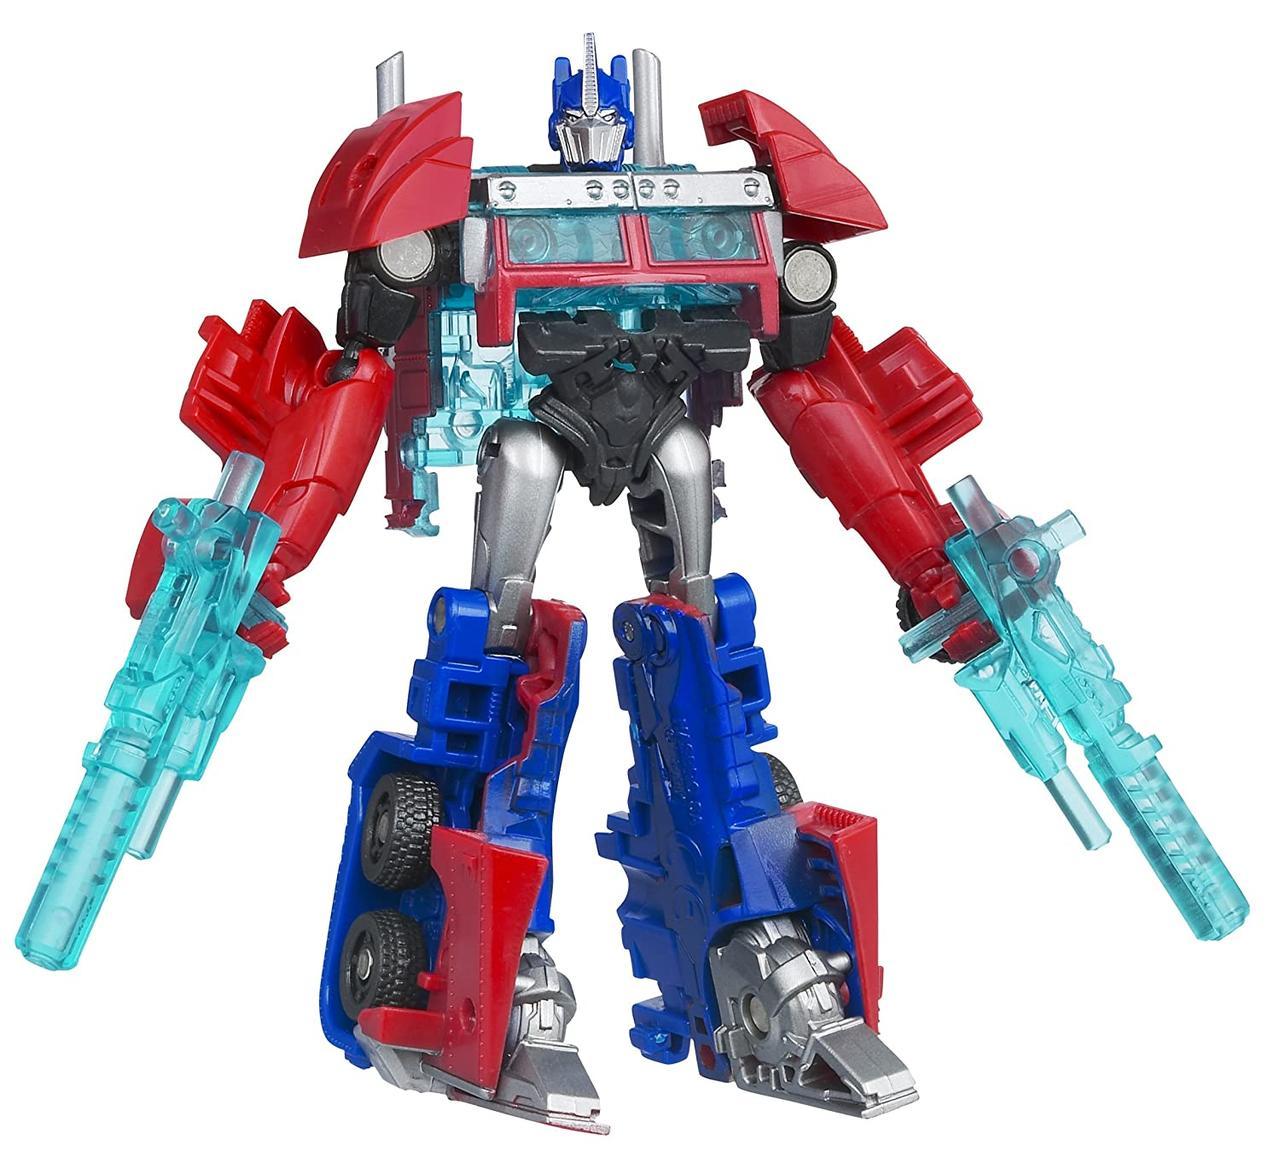 "Робот-трансформер, Hasbro, Оптімус Прайм ""Трансформери Прайм"" - Optimus Prime, ""Transformers Prime"" Cyberverse"